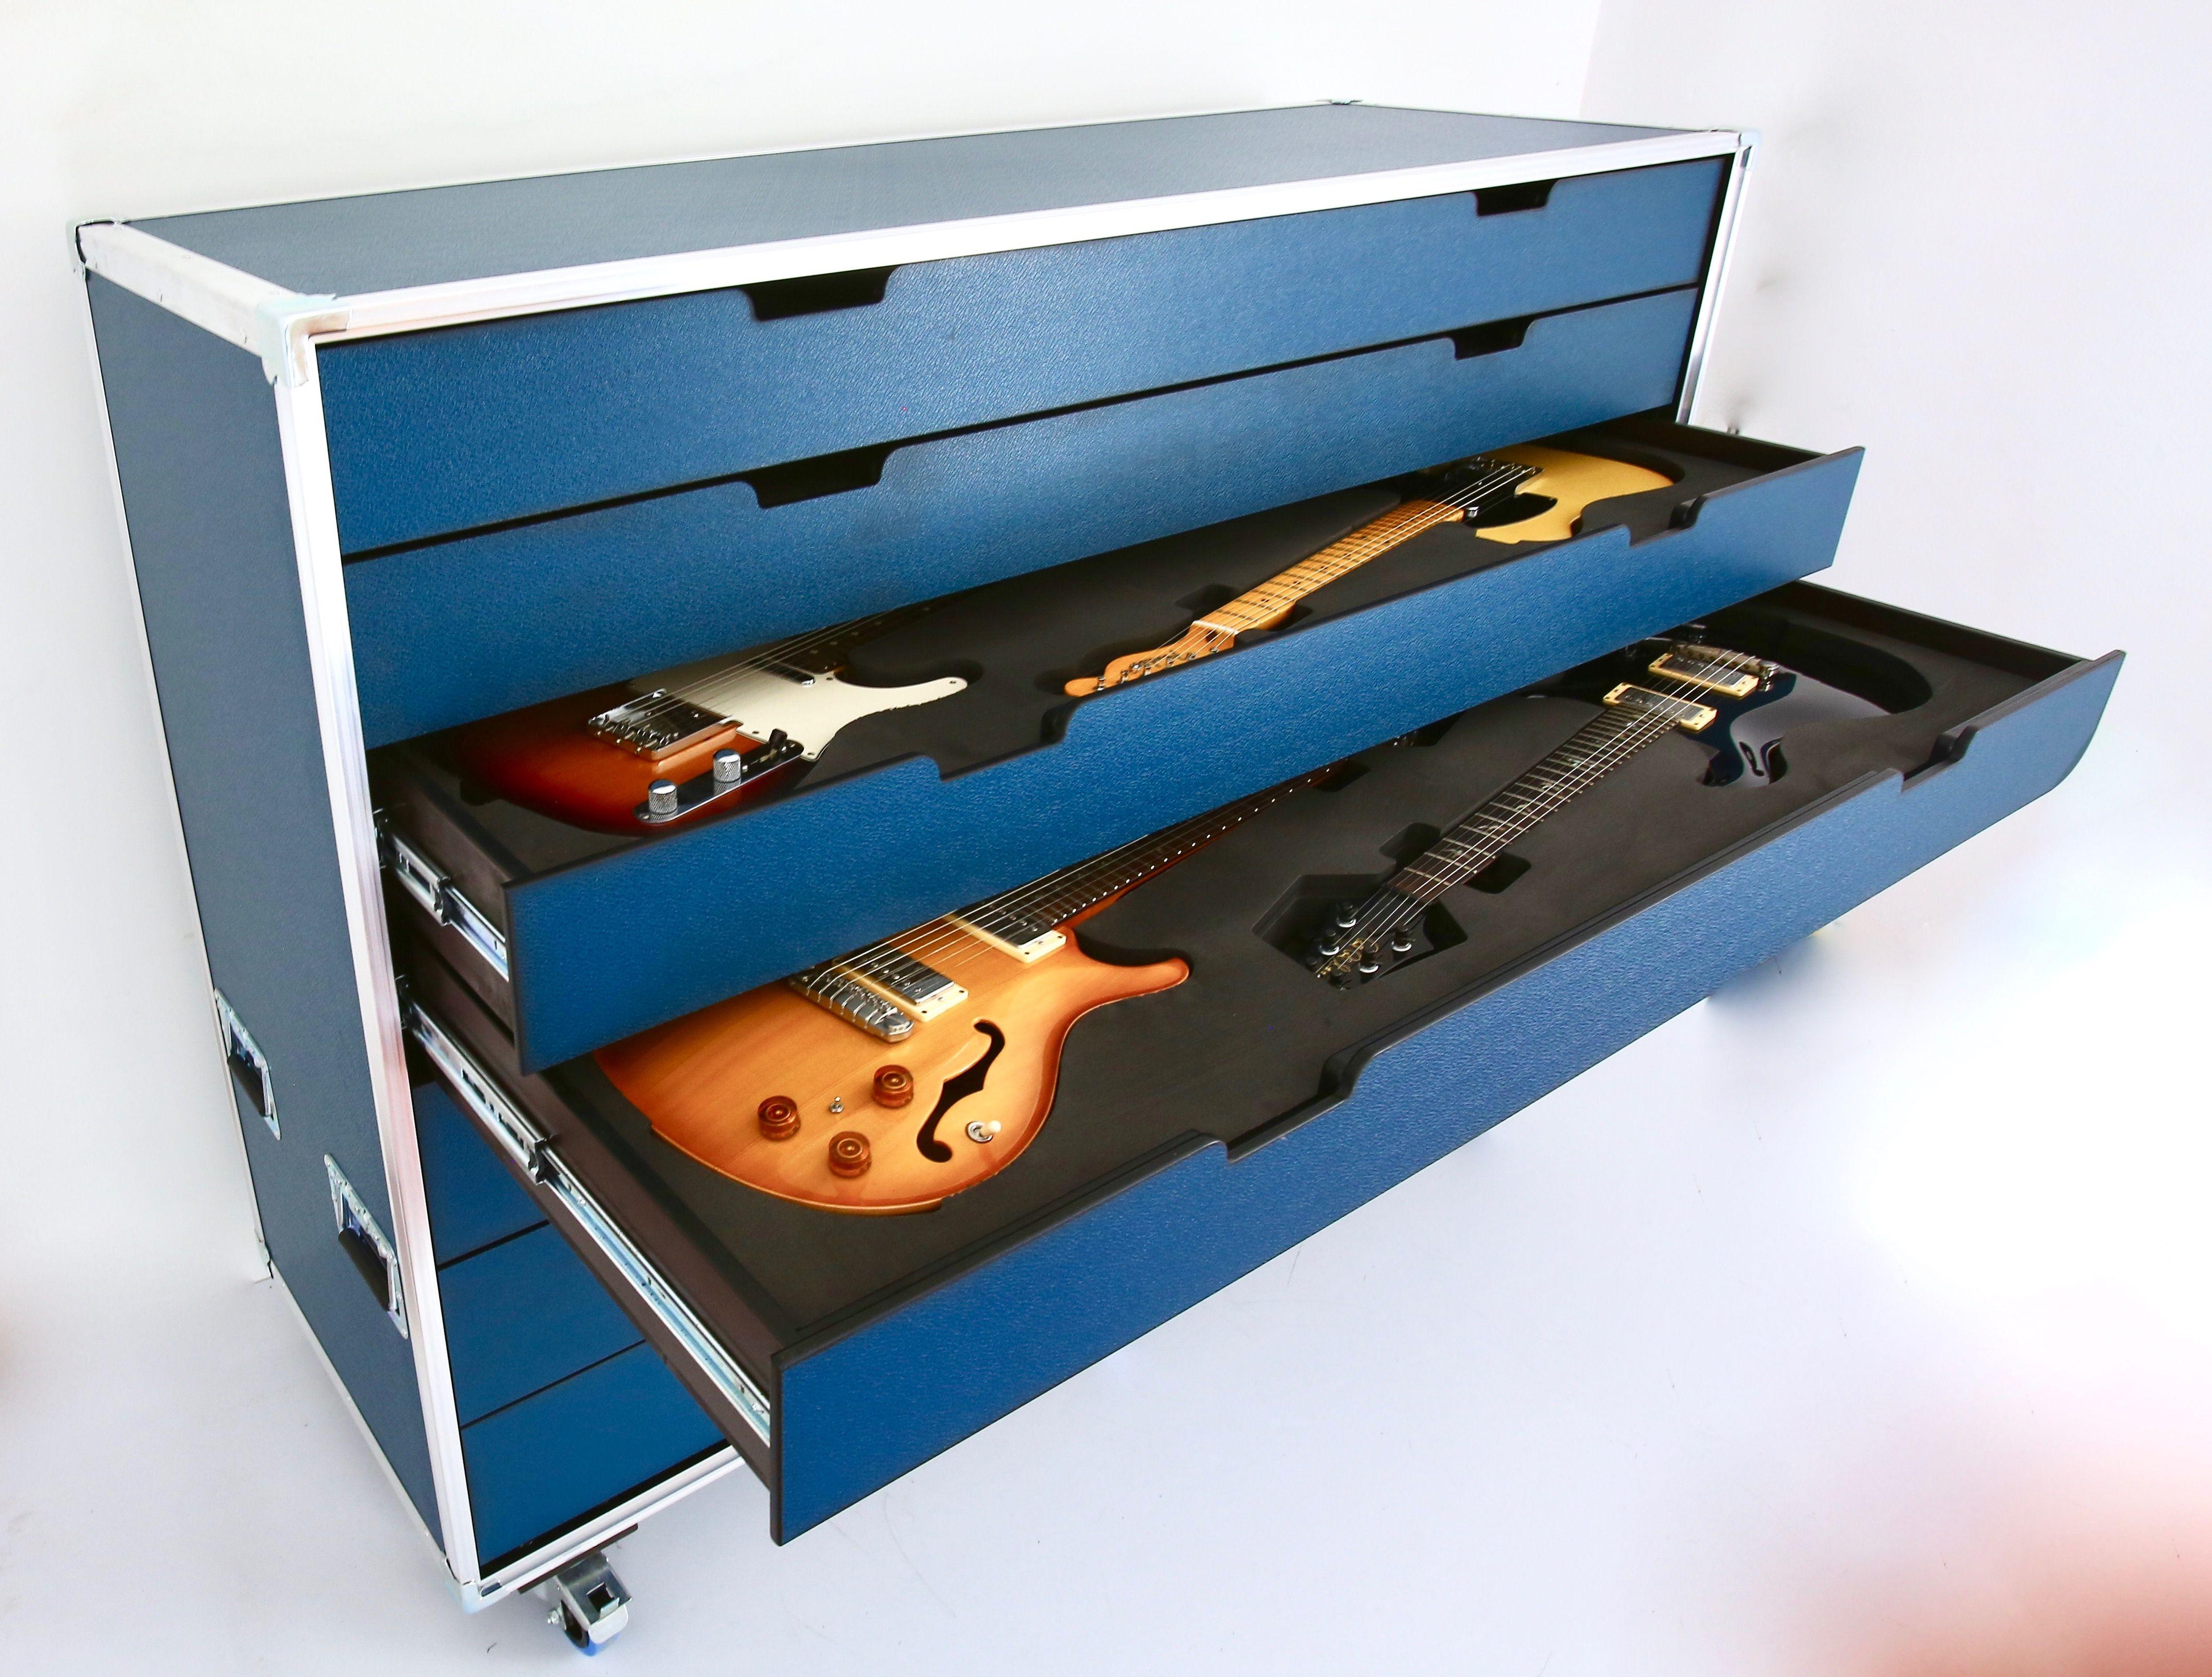 Guitar Flight Case Flighcase Wearepartoftheshow Santosomflight Cases Santosomprofessionalcases Guitar Room Guitar Studio Guitar Storage